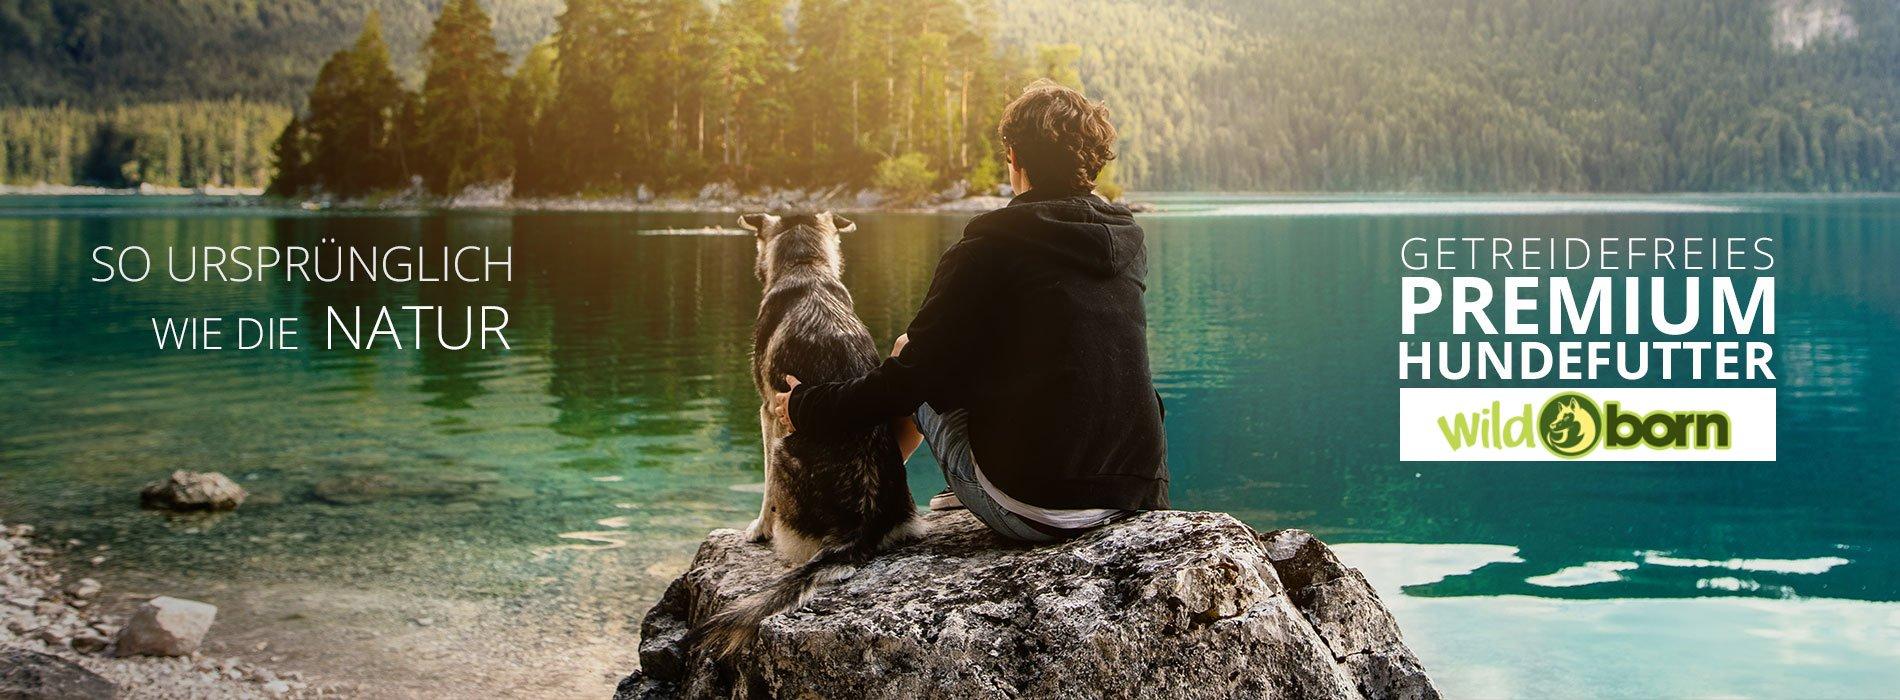 Wildborn Hundefutter Onlineshop